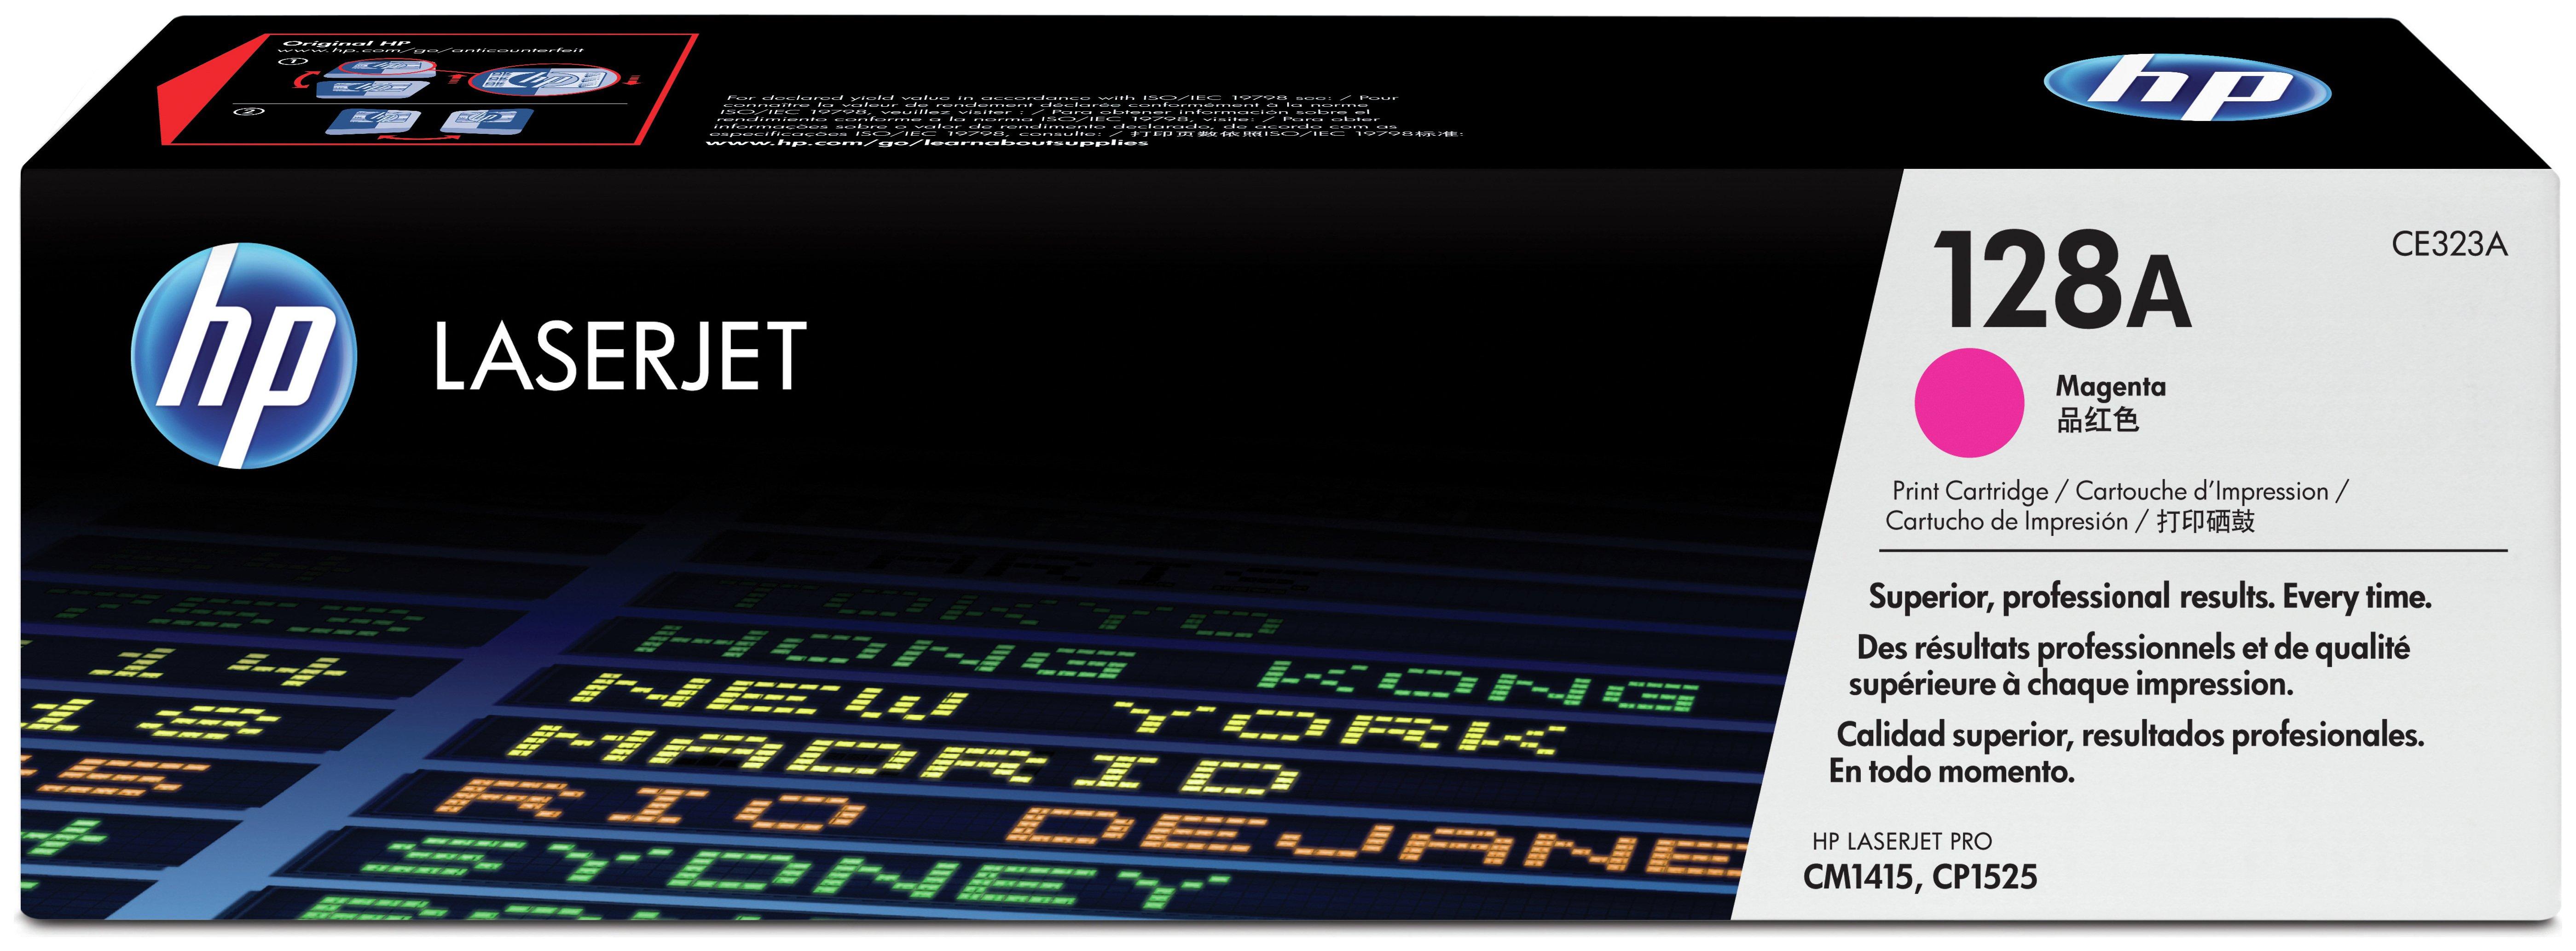 HP - 128A Magenta LaserJet - Toner Cartridge (CE323A)